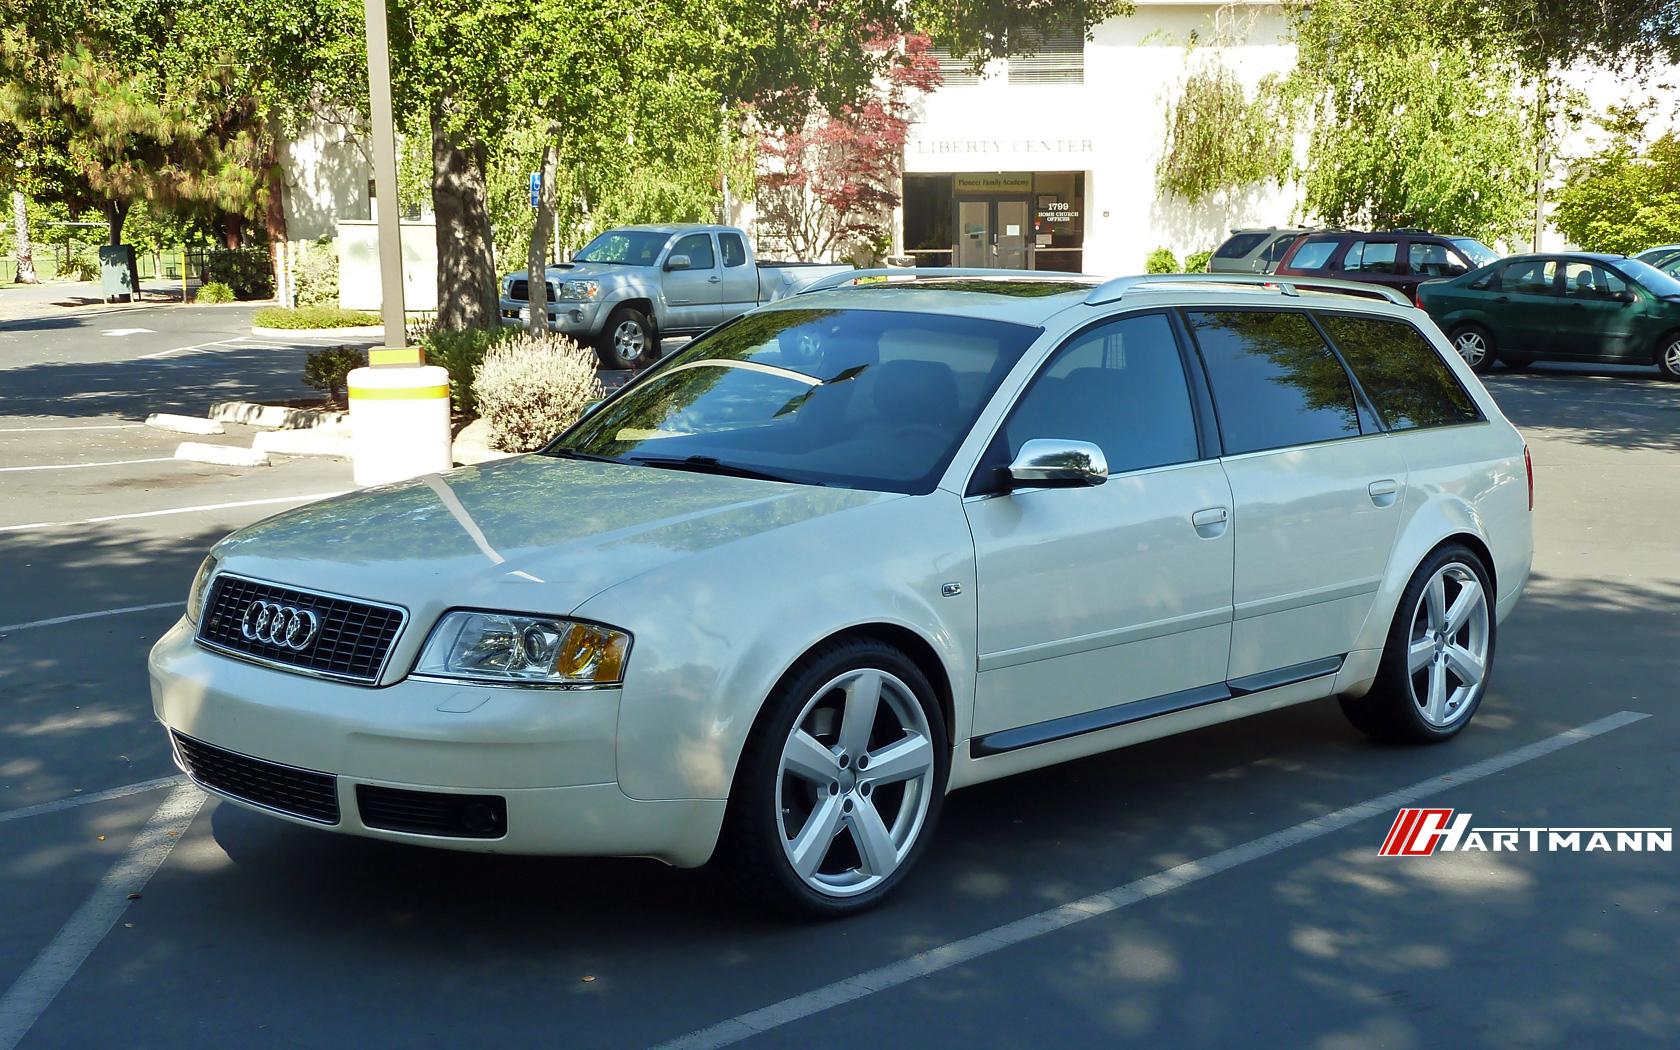 Audi c5 s6 hartmann wheels hrs6 172 gs 19 mb1 hwm